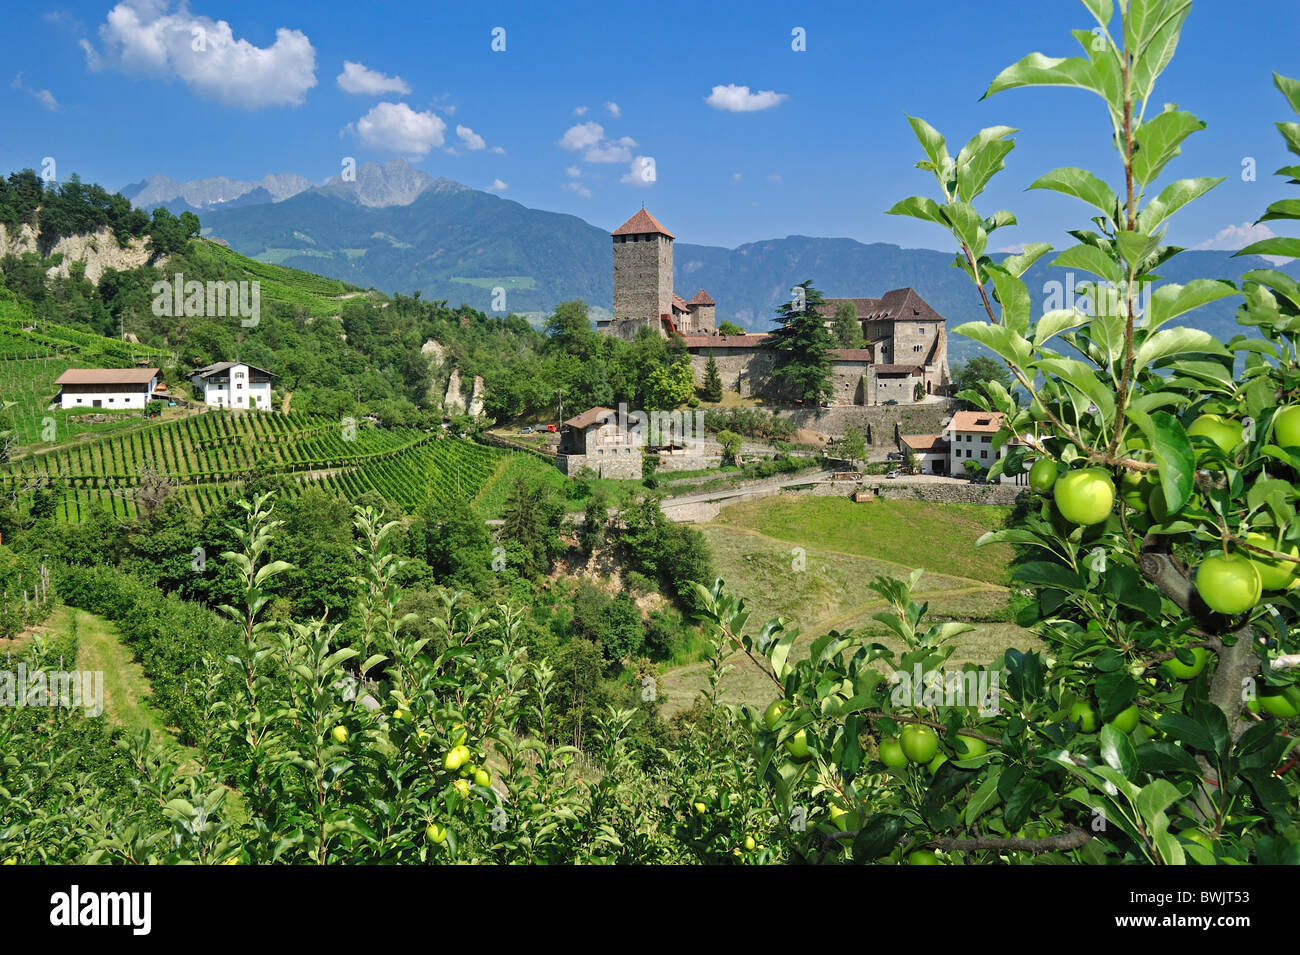 The castle Schloss Tirol and apple orchard at Tirolo / Dorf Tirol, Dolomites, Italy - Stock Image